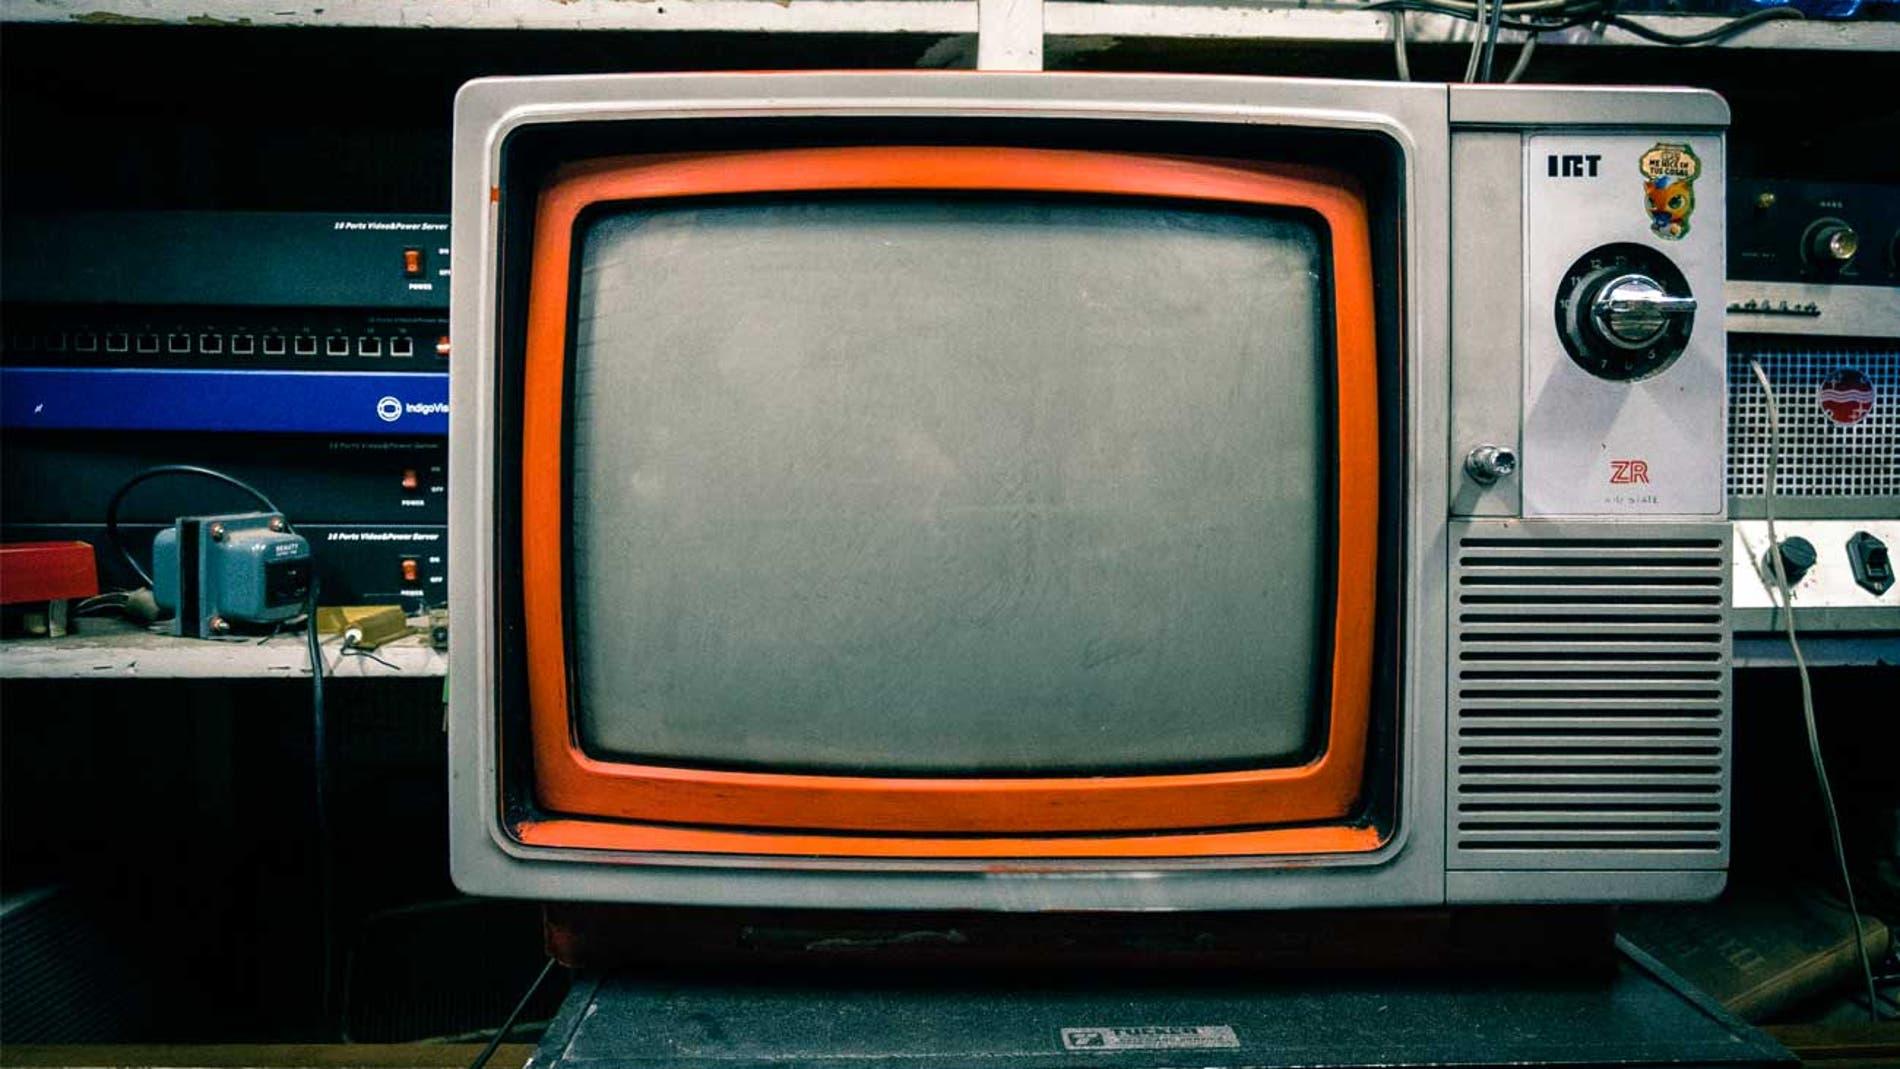 Conecta dispositivos HDMI a tu viejo televisor